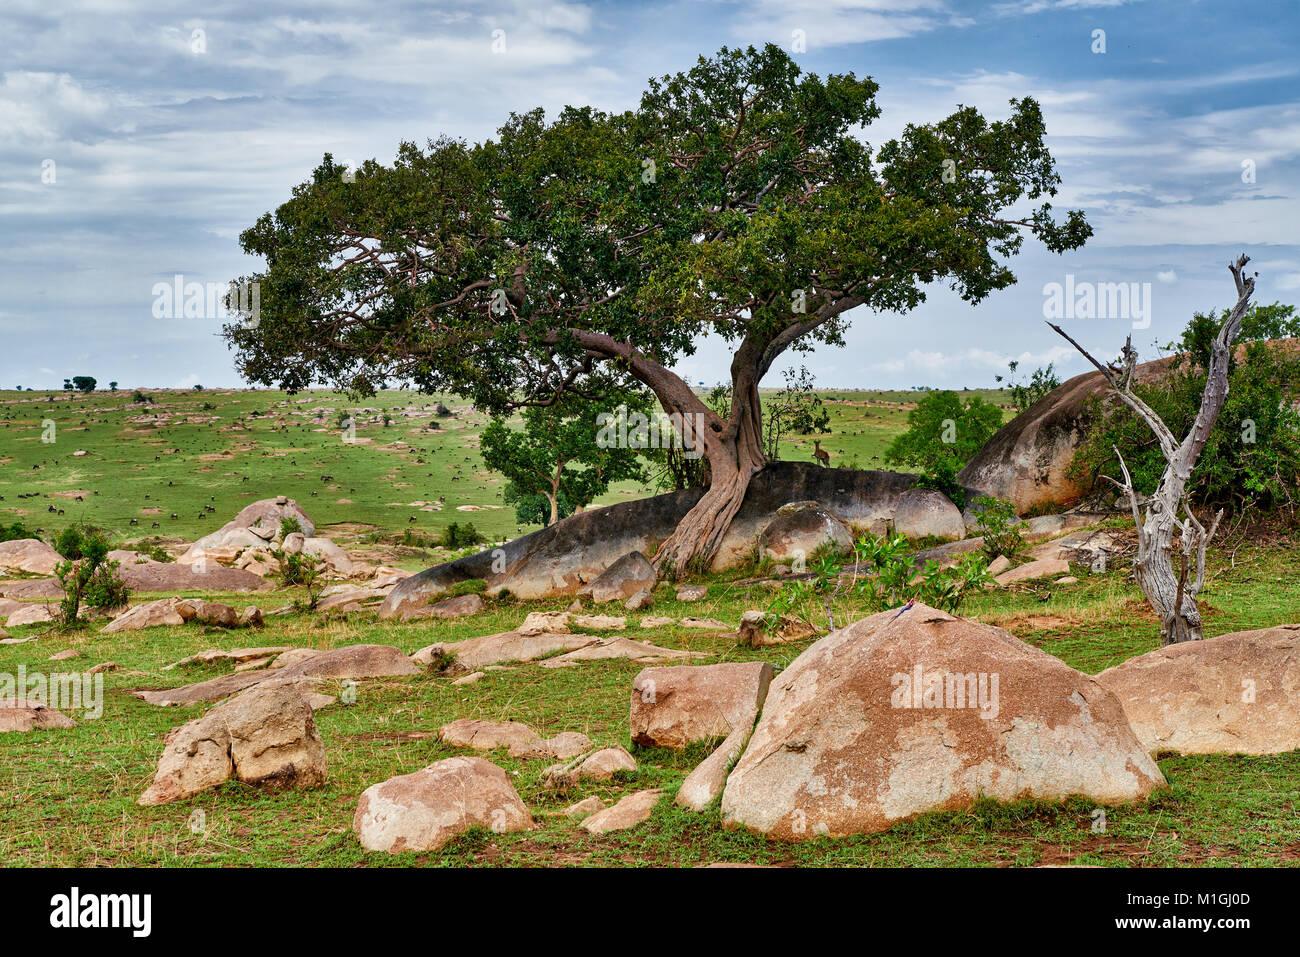 landscape of Serengeti National Park, UNESCO world heritage site, Tanzania, Africa - Stock Image